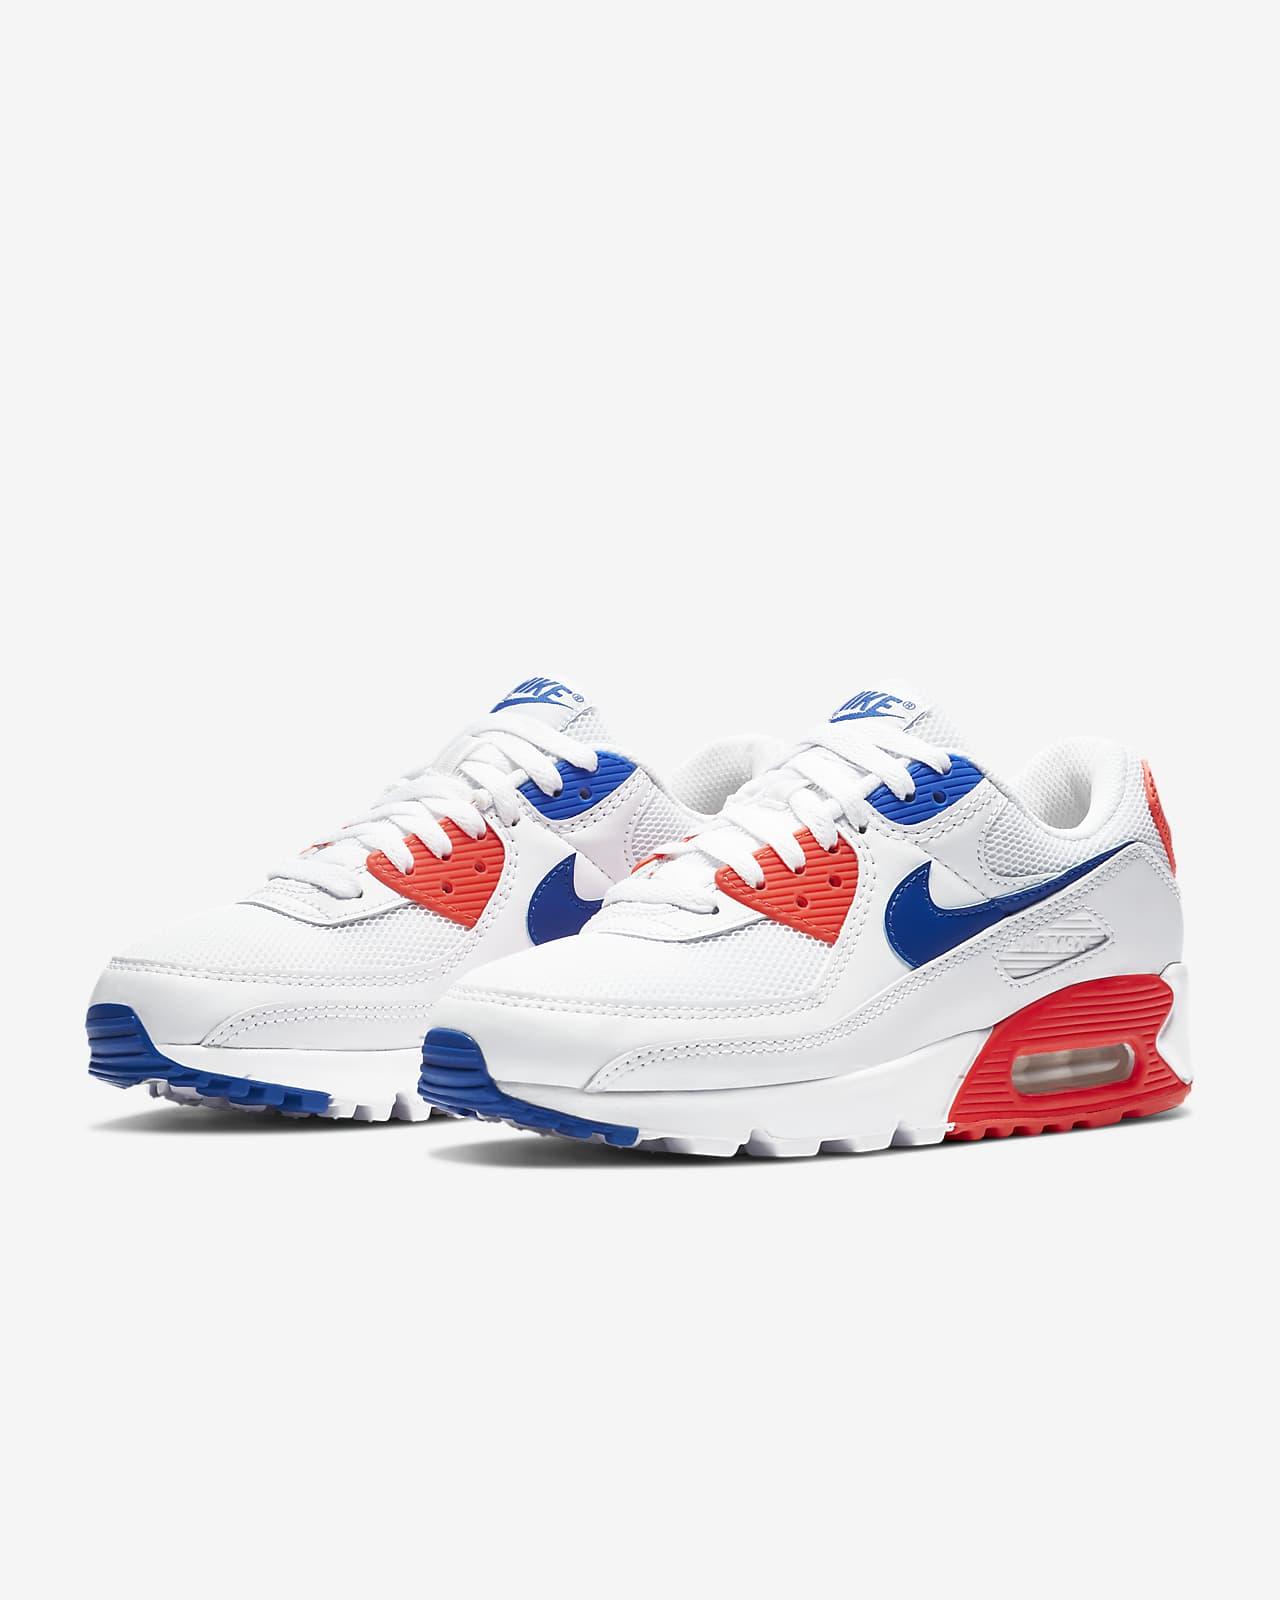 scarpe donna nike air max 90 bianche